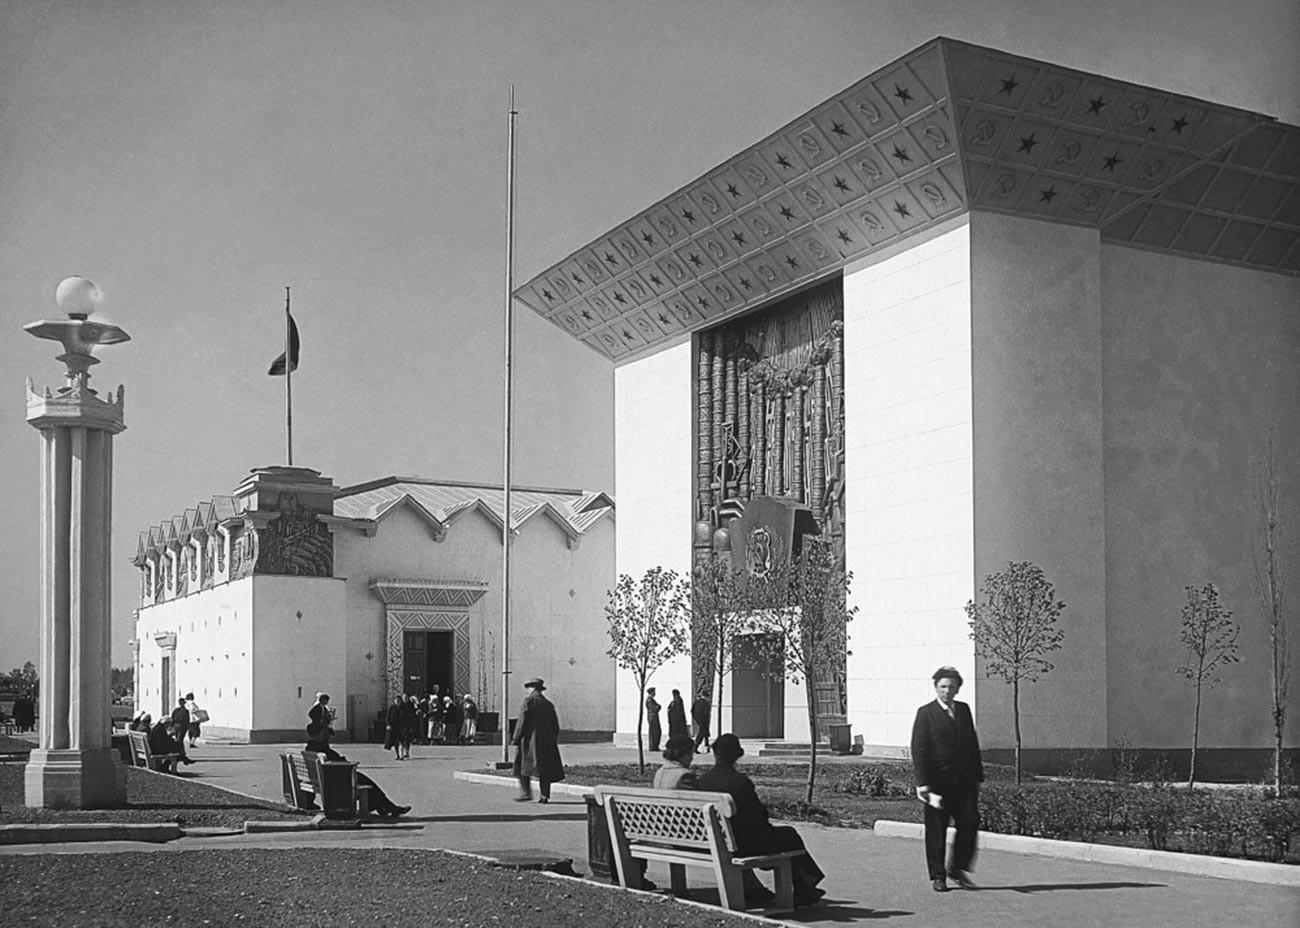 Paviliun Wilayah Sentral Republik Sosialis Federasi Soviet Rusia VSKhV (VDNKh), 1939.